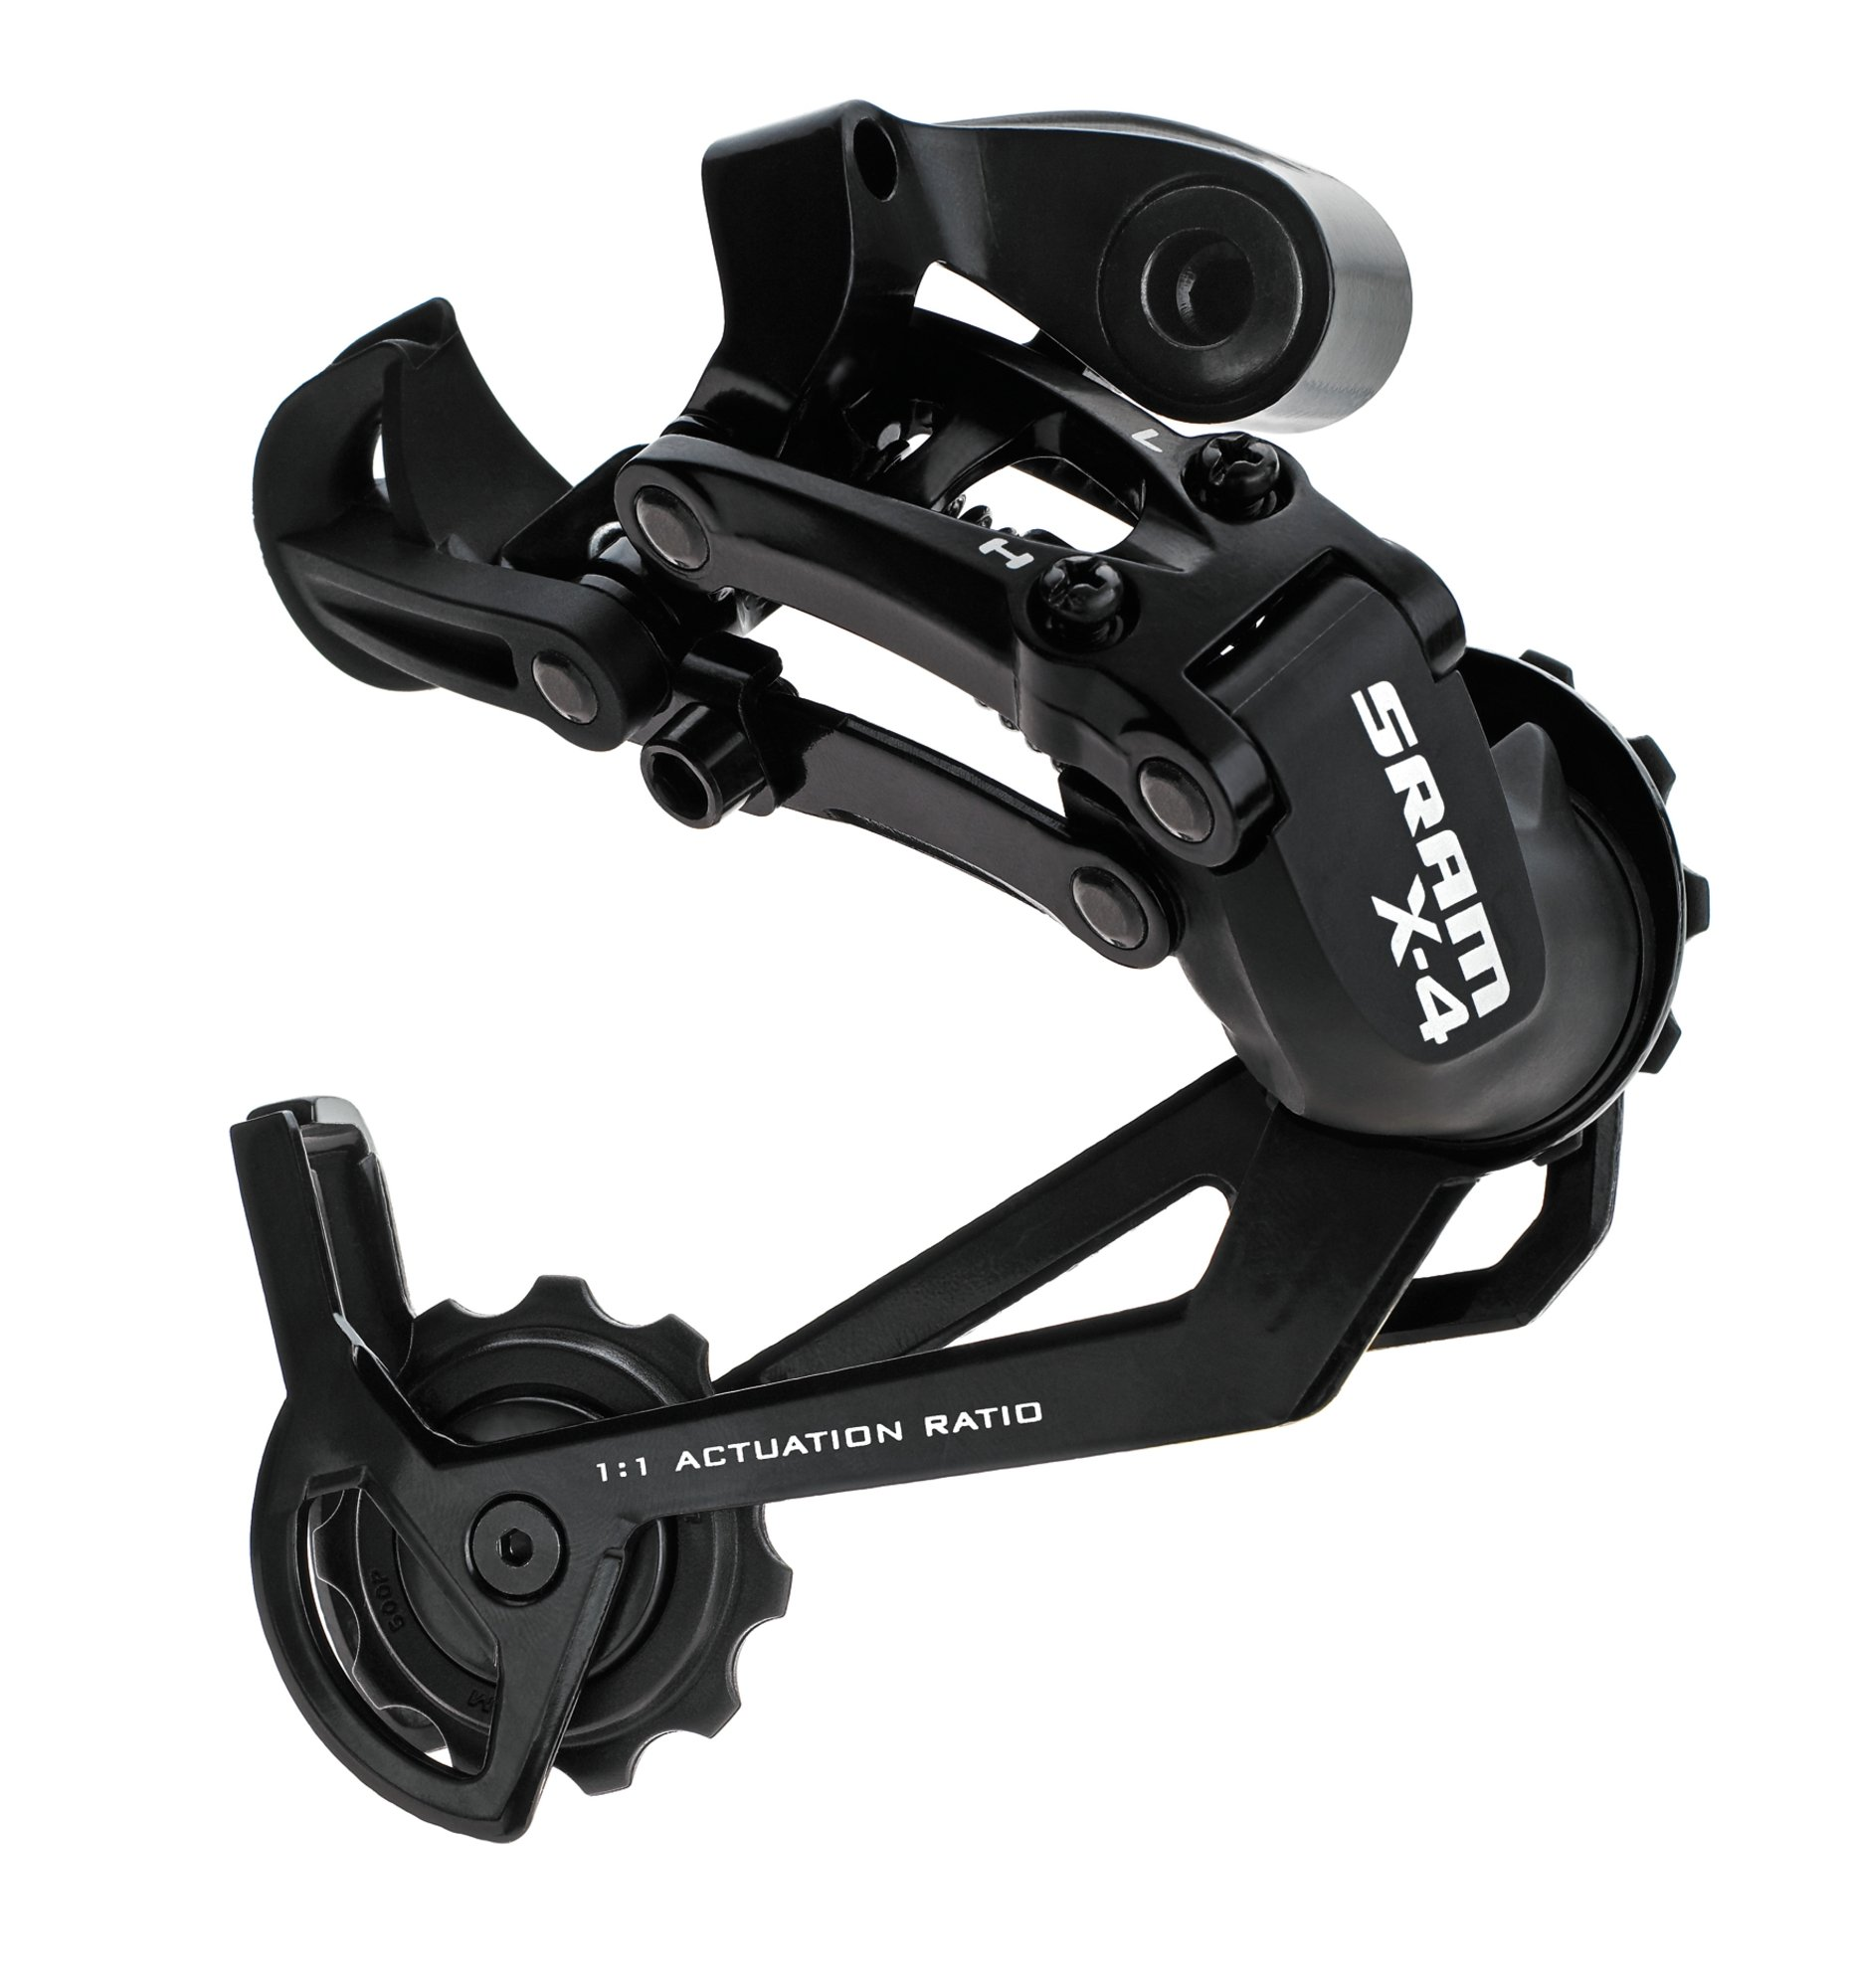 SRAM X.4 Rear Derailleur (Black, Long Cage) by SRAM